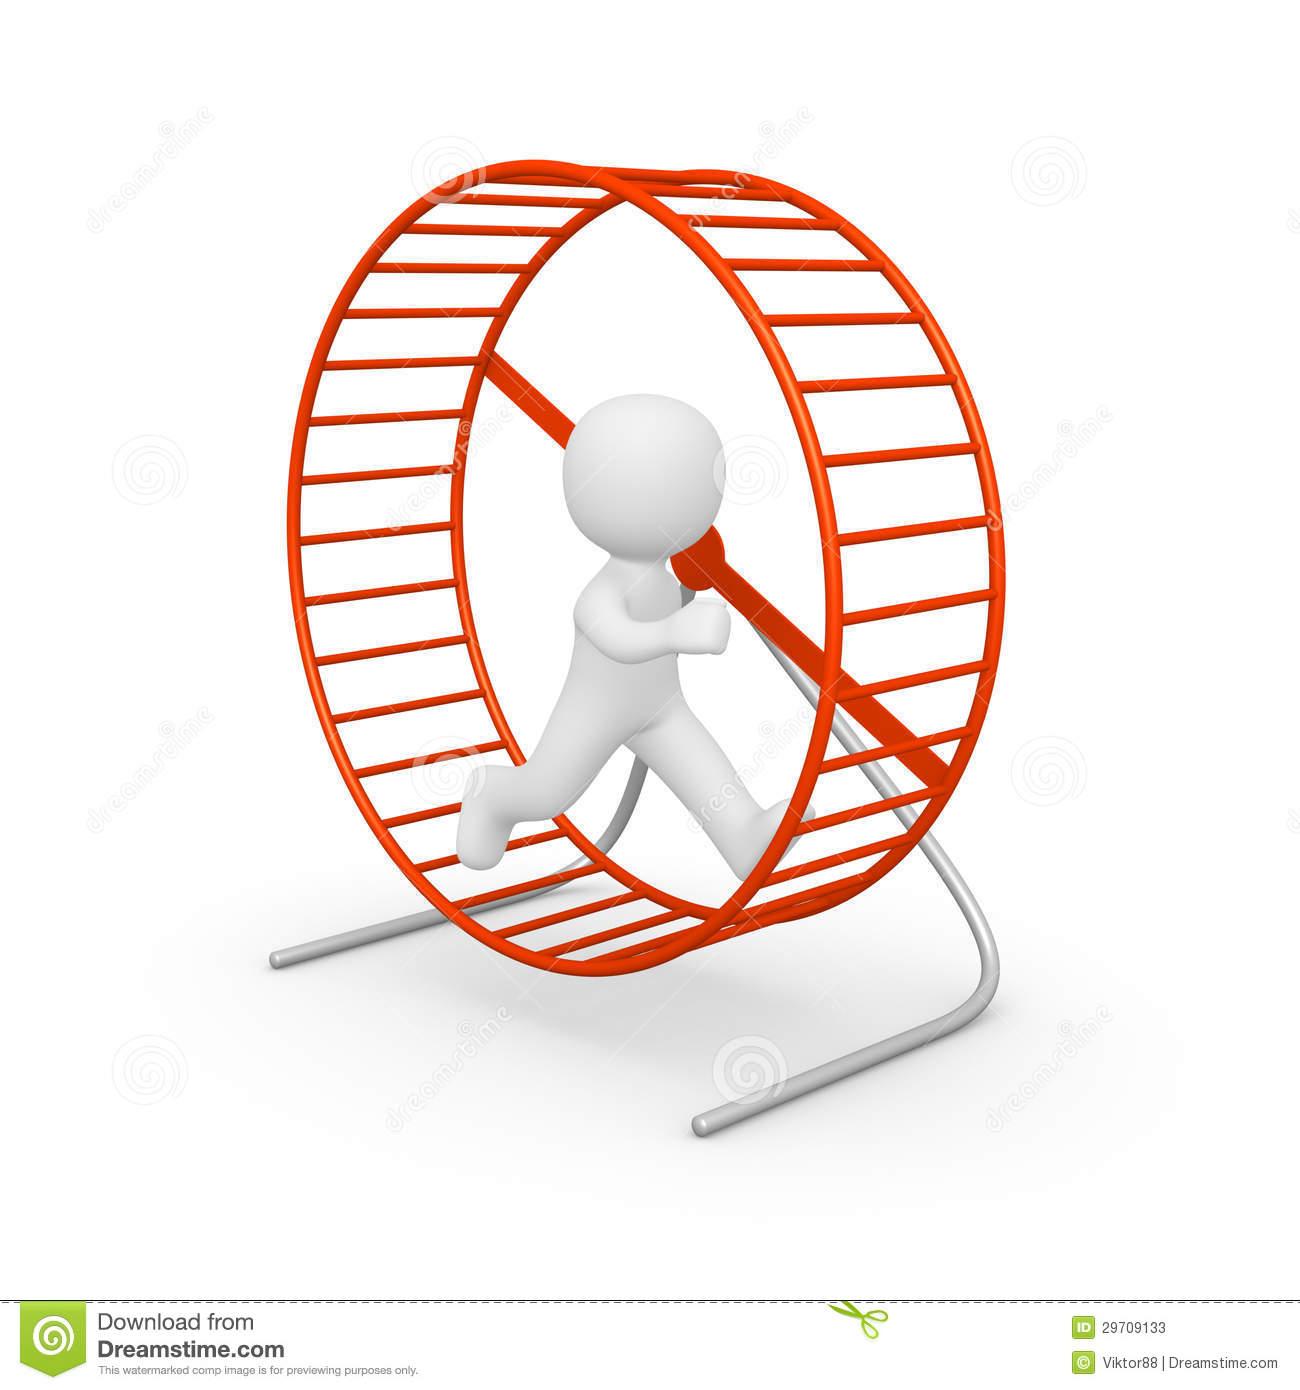 People On Hamster Wheel Clipart.